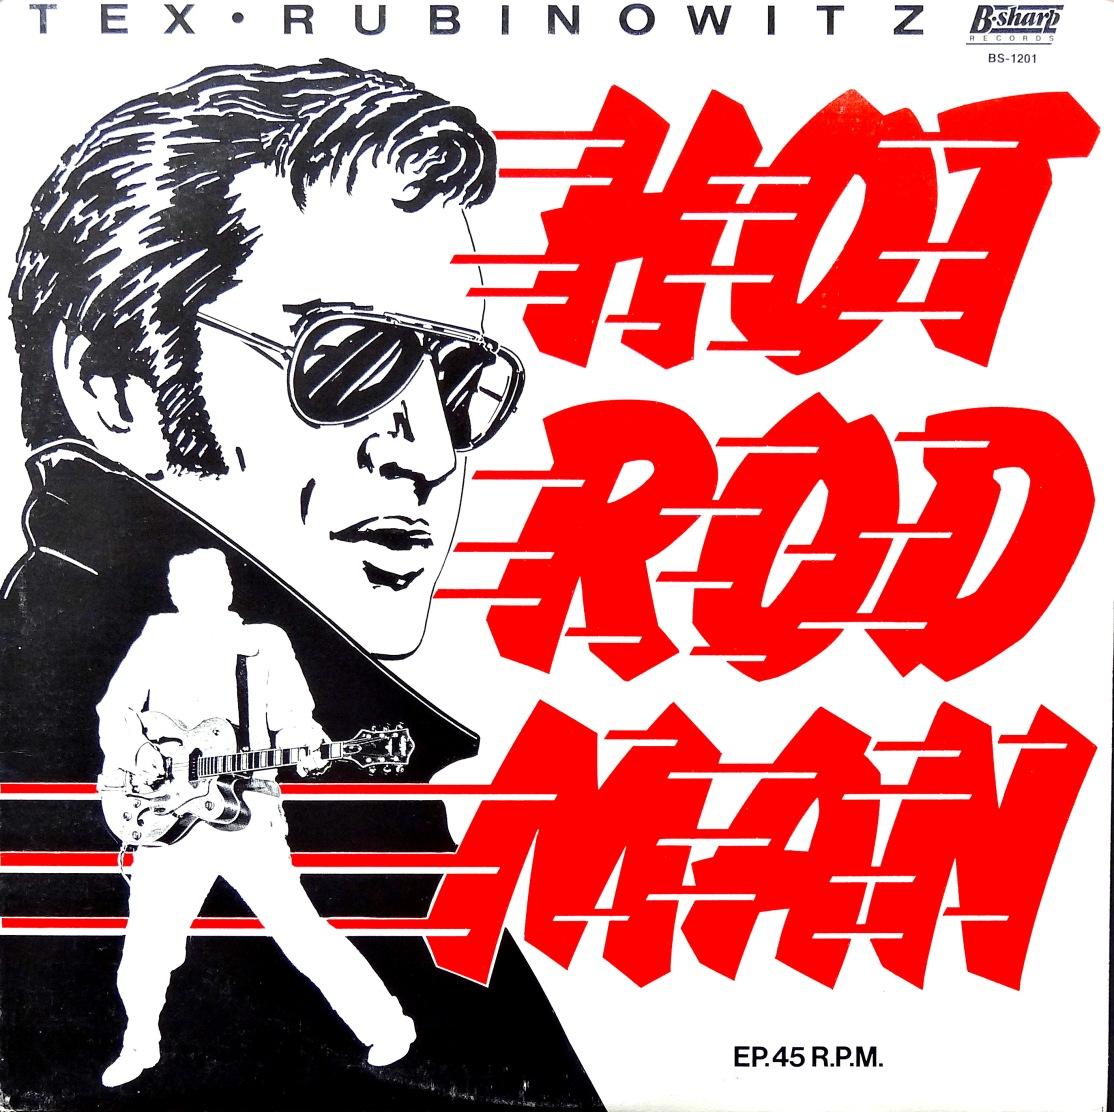 tex-rubinowitz-hot-rod-man-front